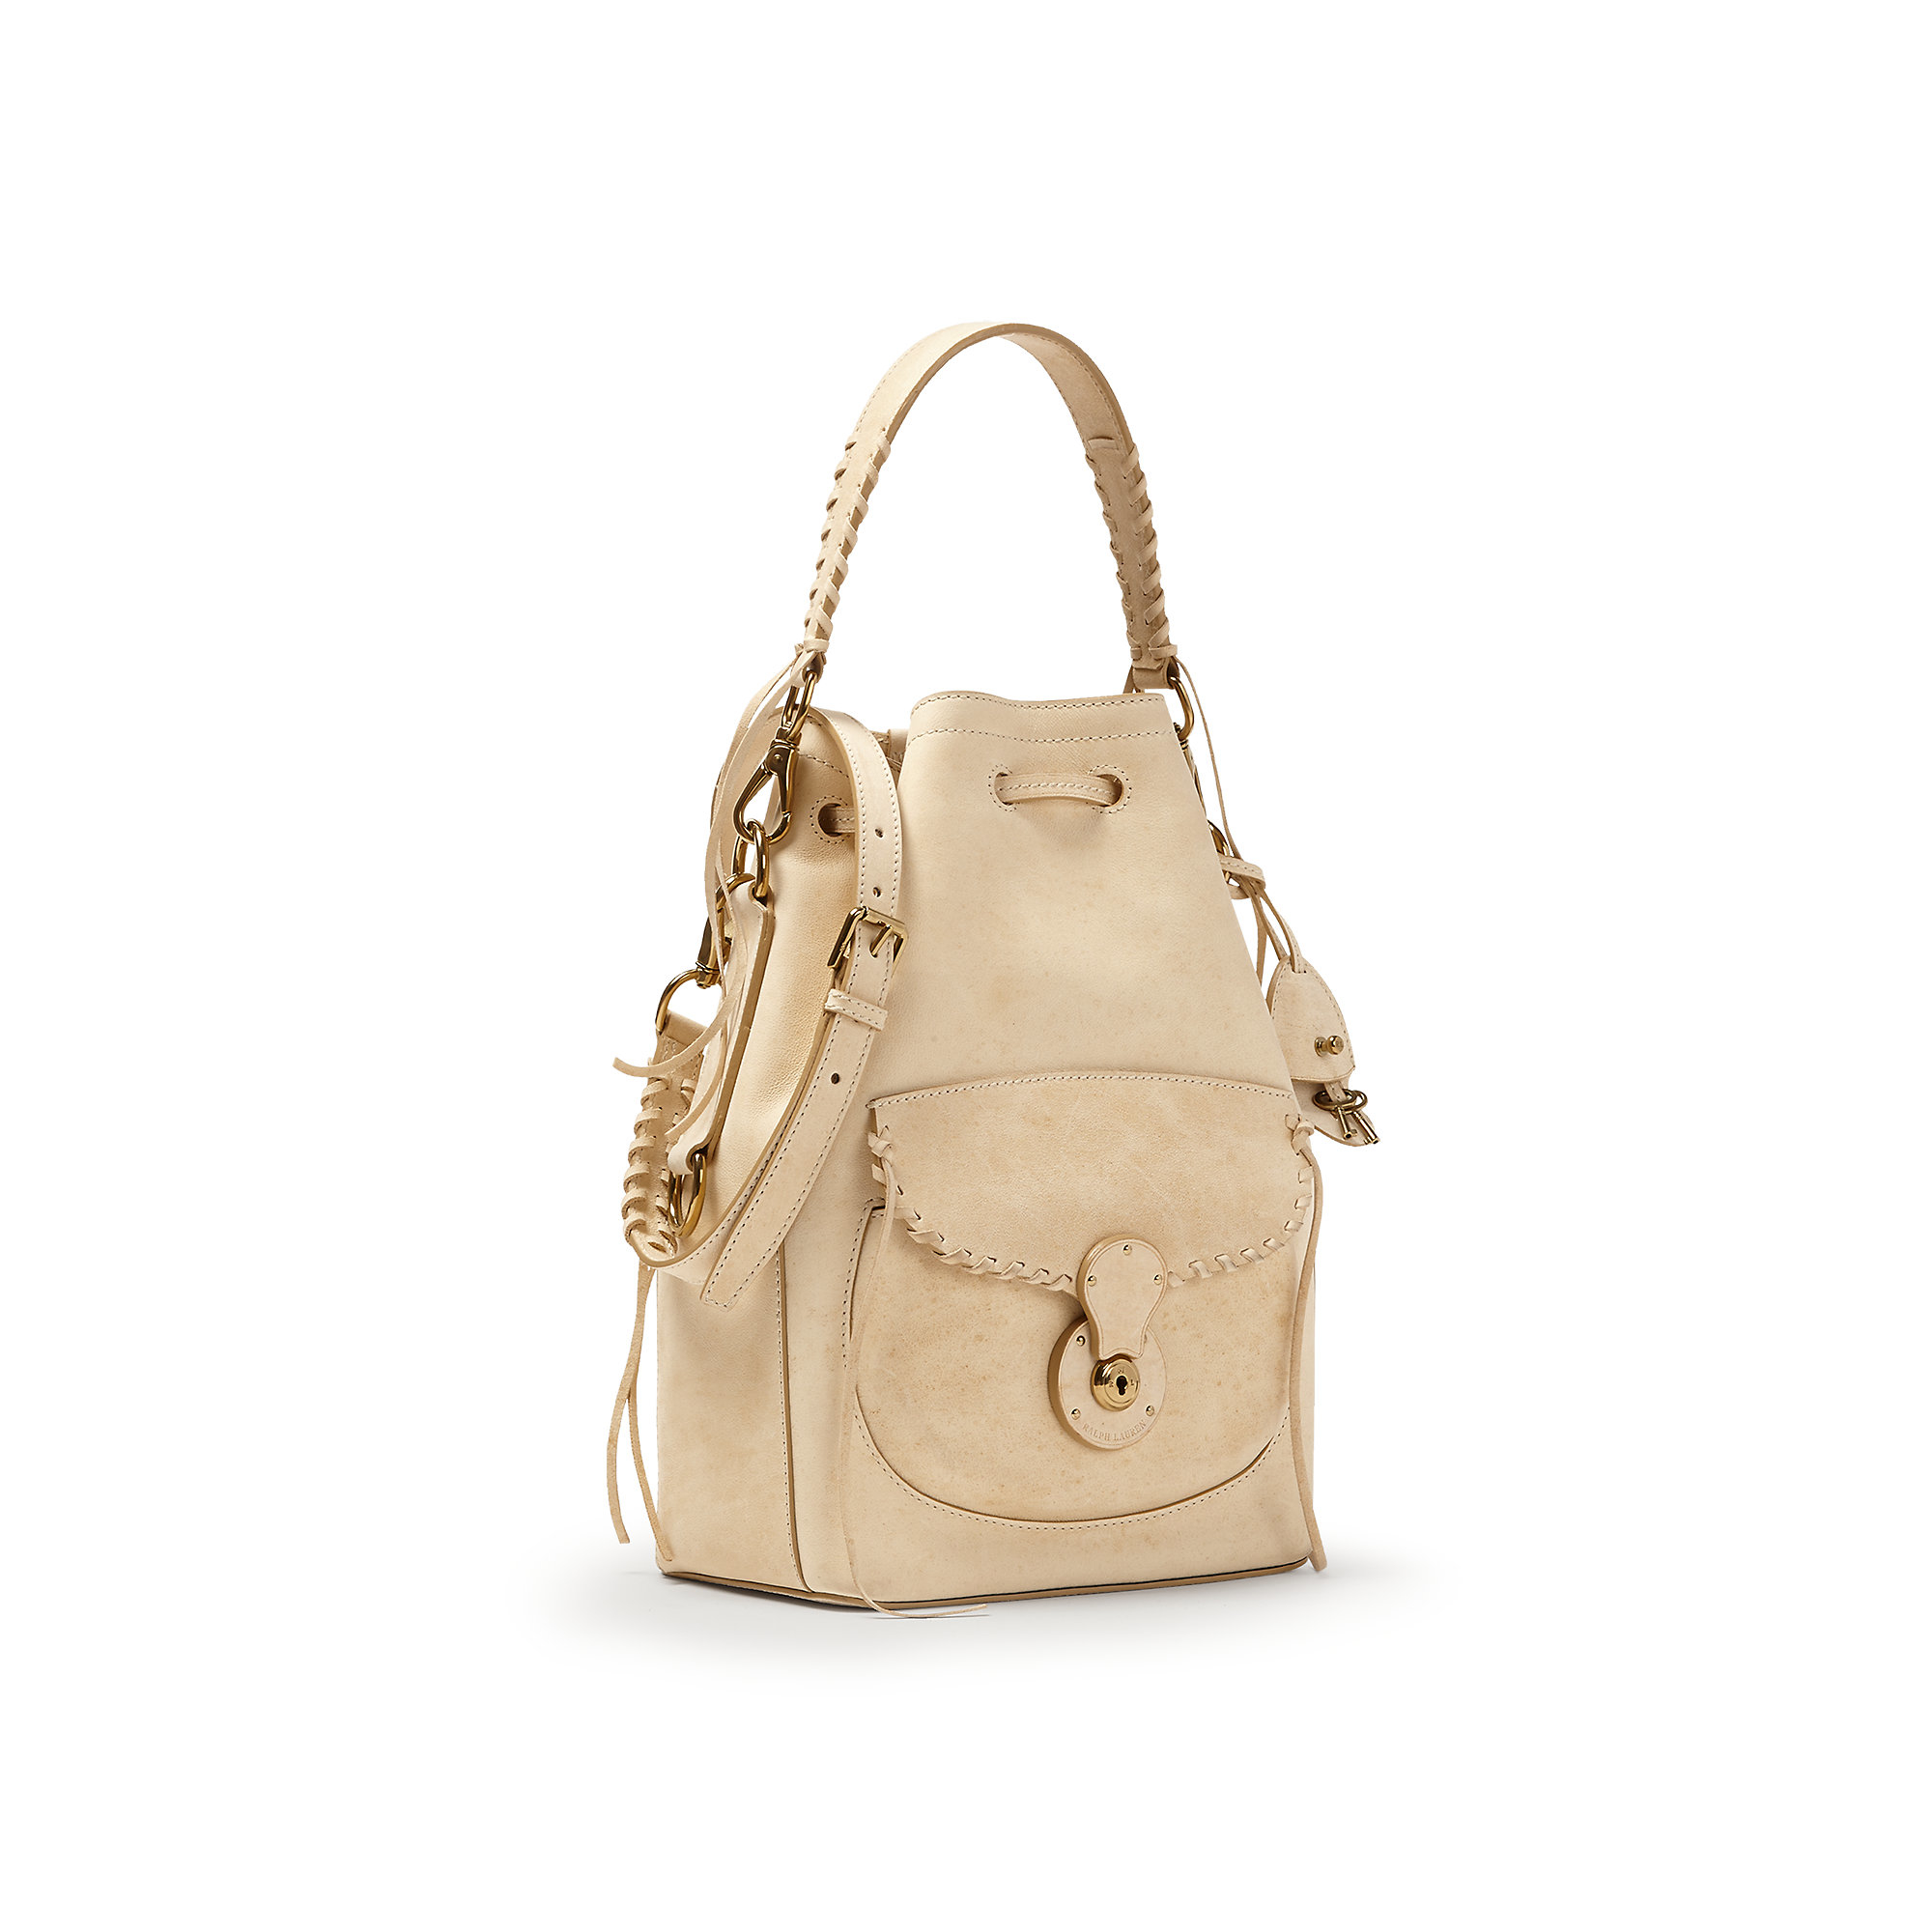 1d825050aca7 Lyst - Ralph Lauren Ricky Drawstring Bag in Natural